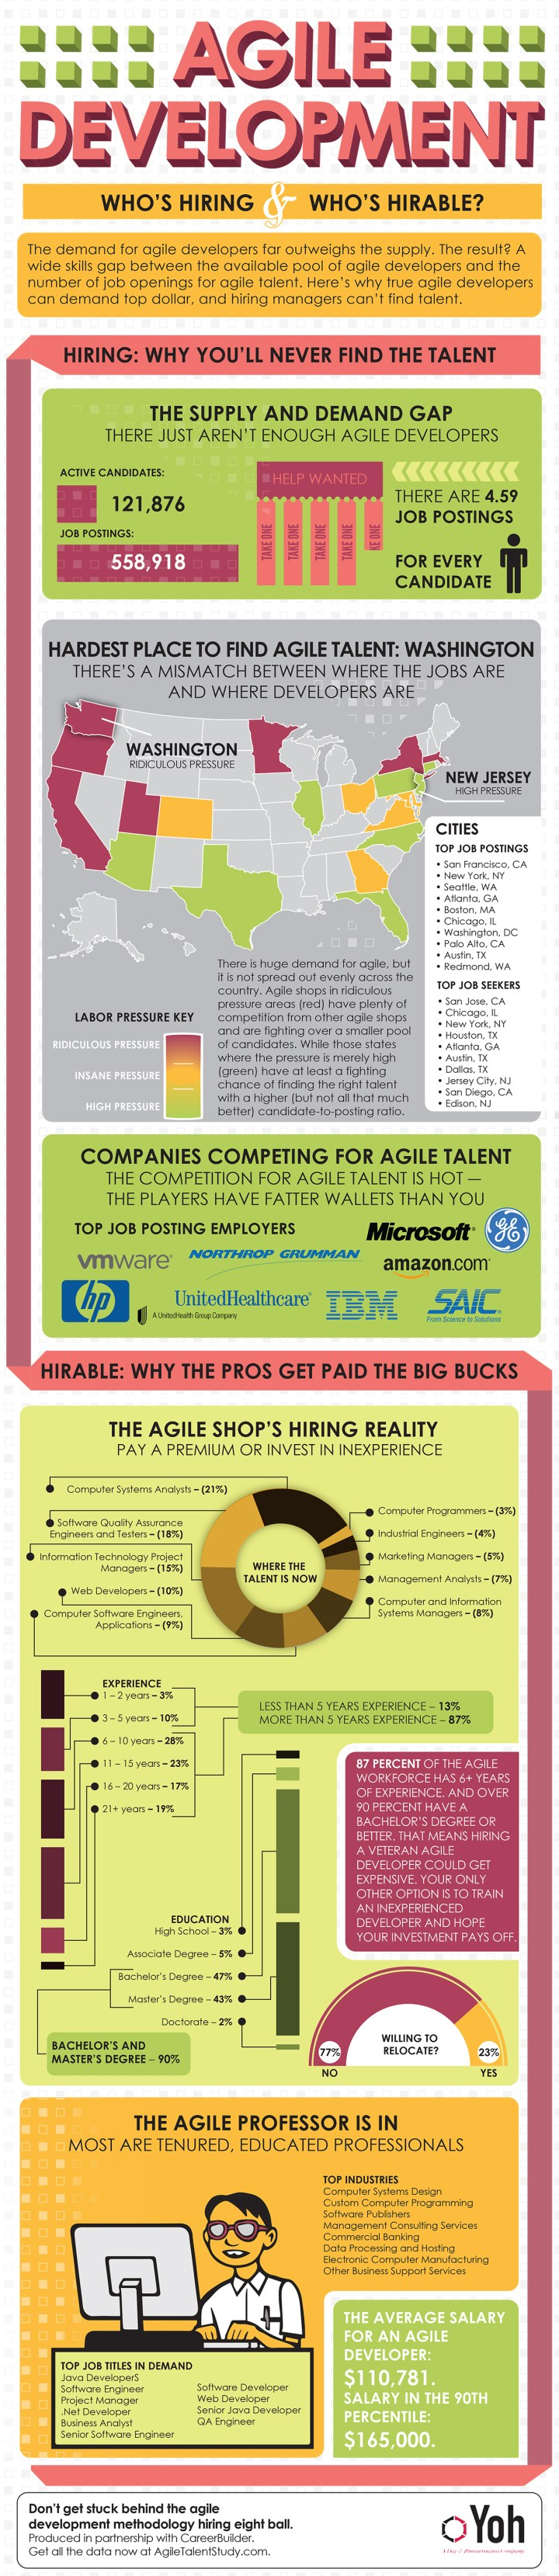 agile-development-whos-hiring--whos-hirable_50fd84145617d